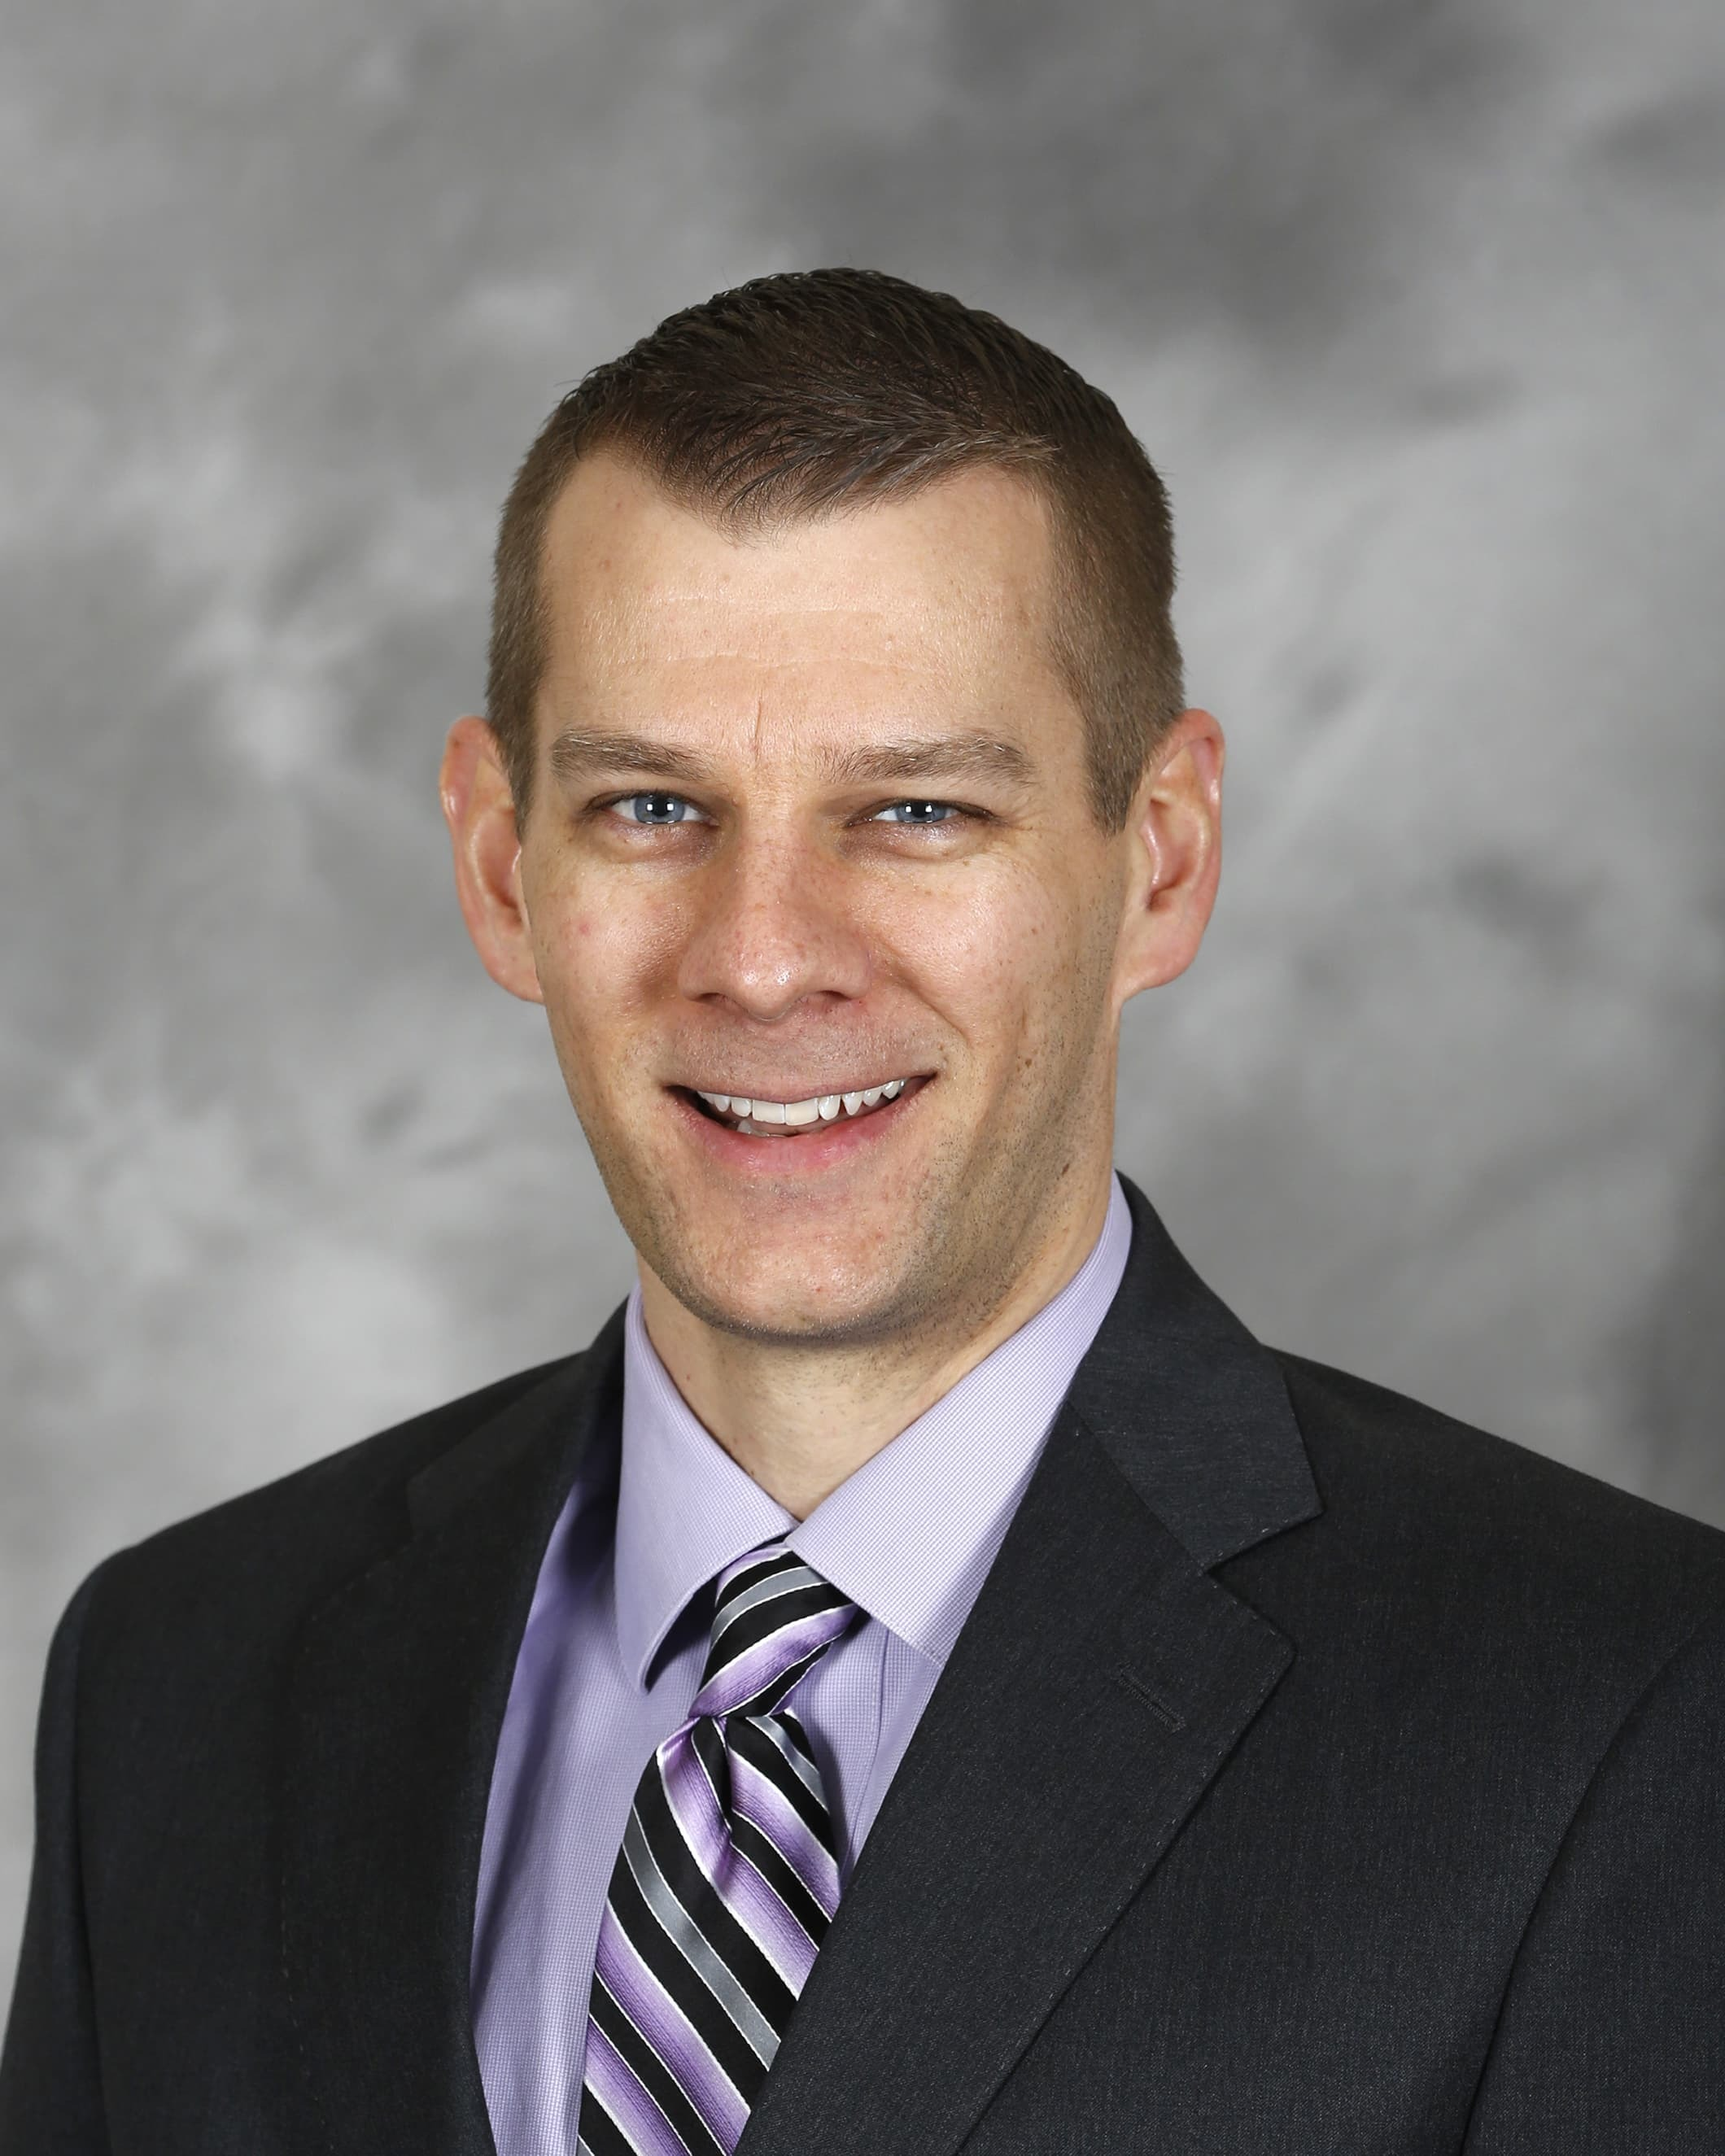 Jesse L Spear, MD, FACP